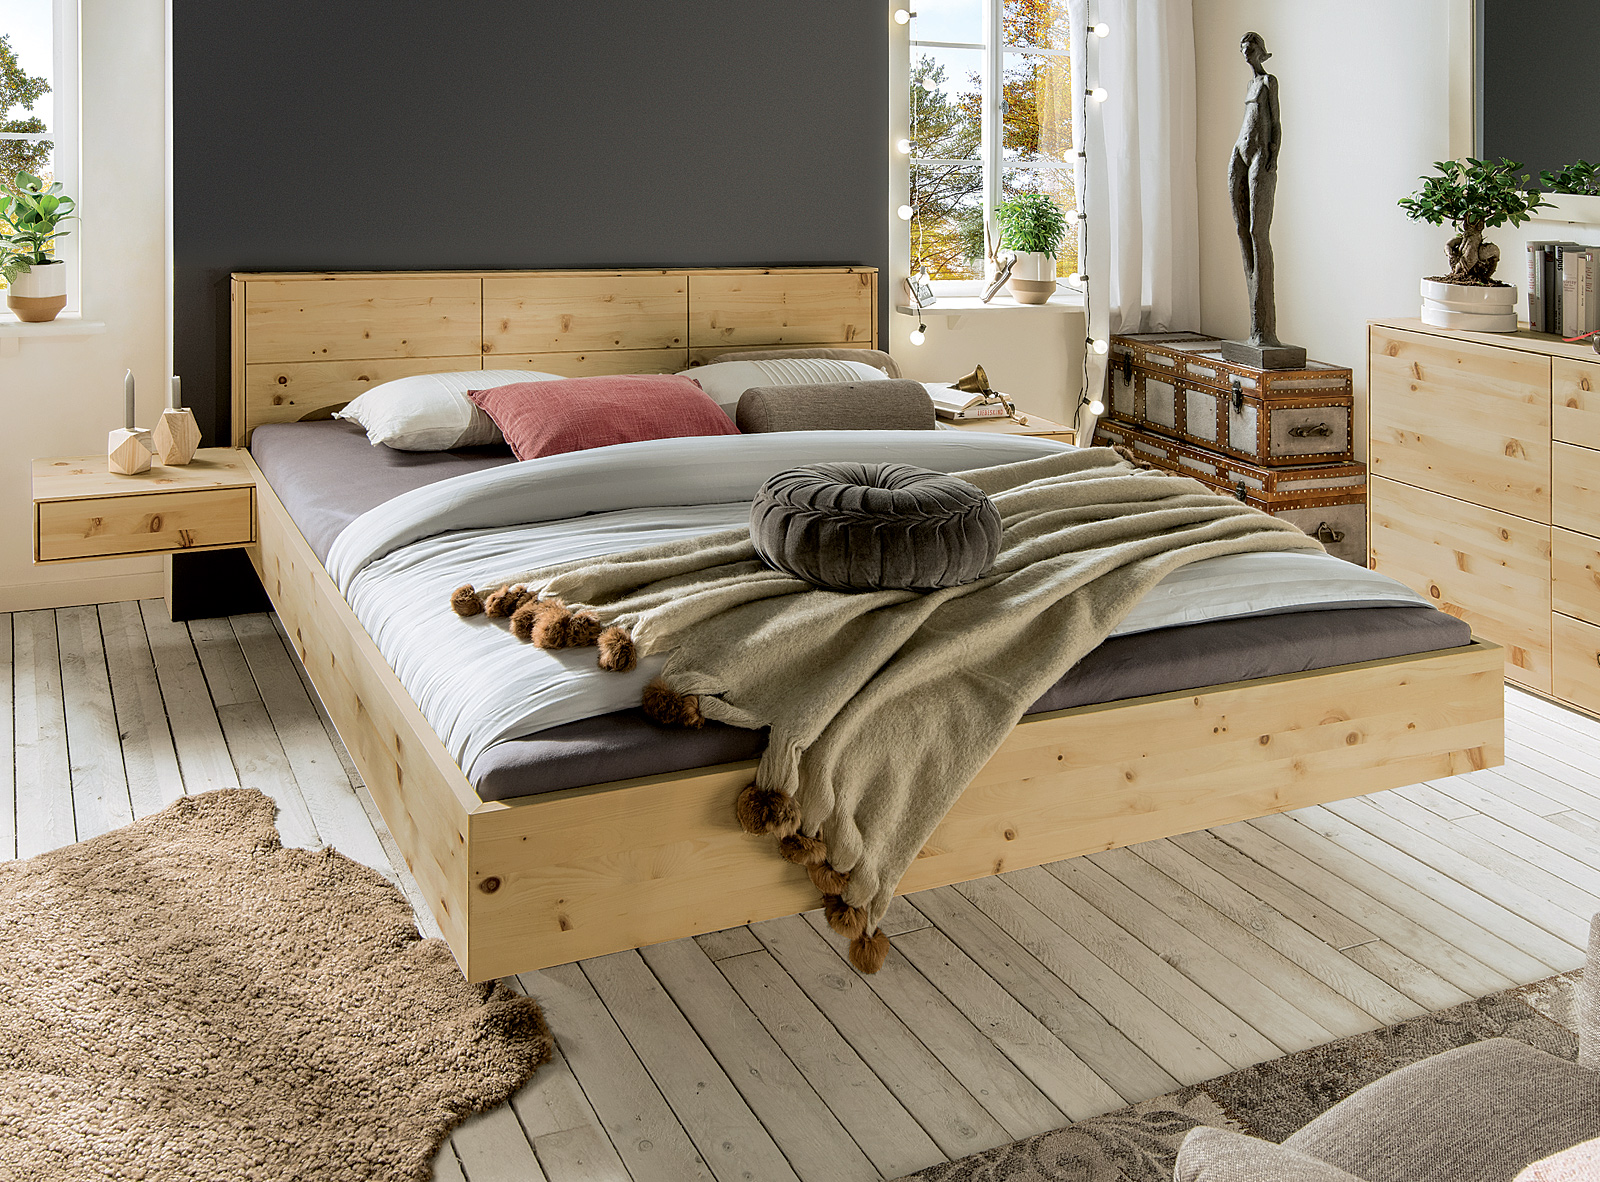 schwebebett cervino. Black Bedroom Furniture Sets. Home Design Ideas